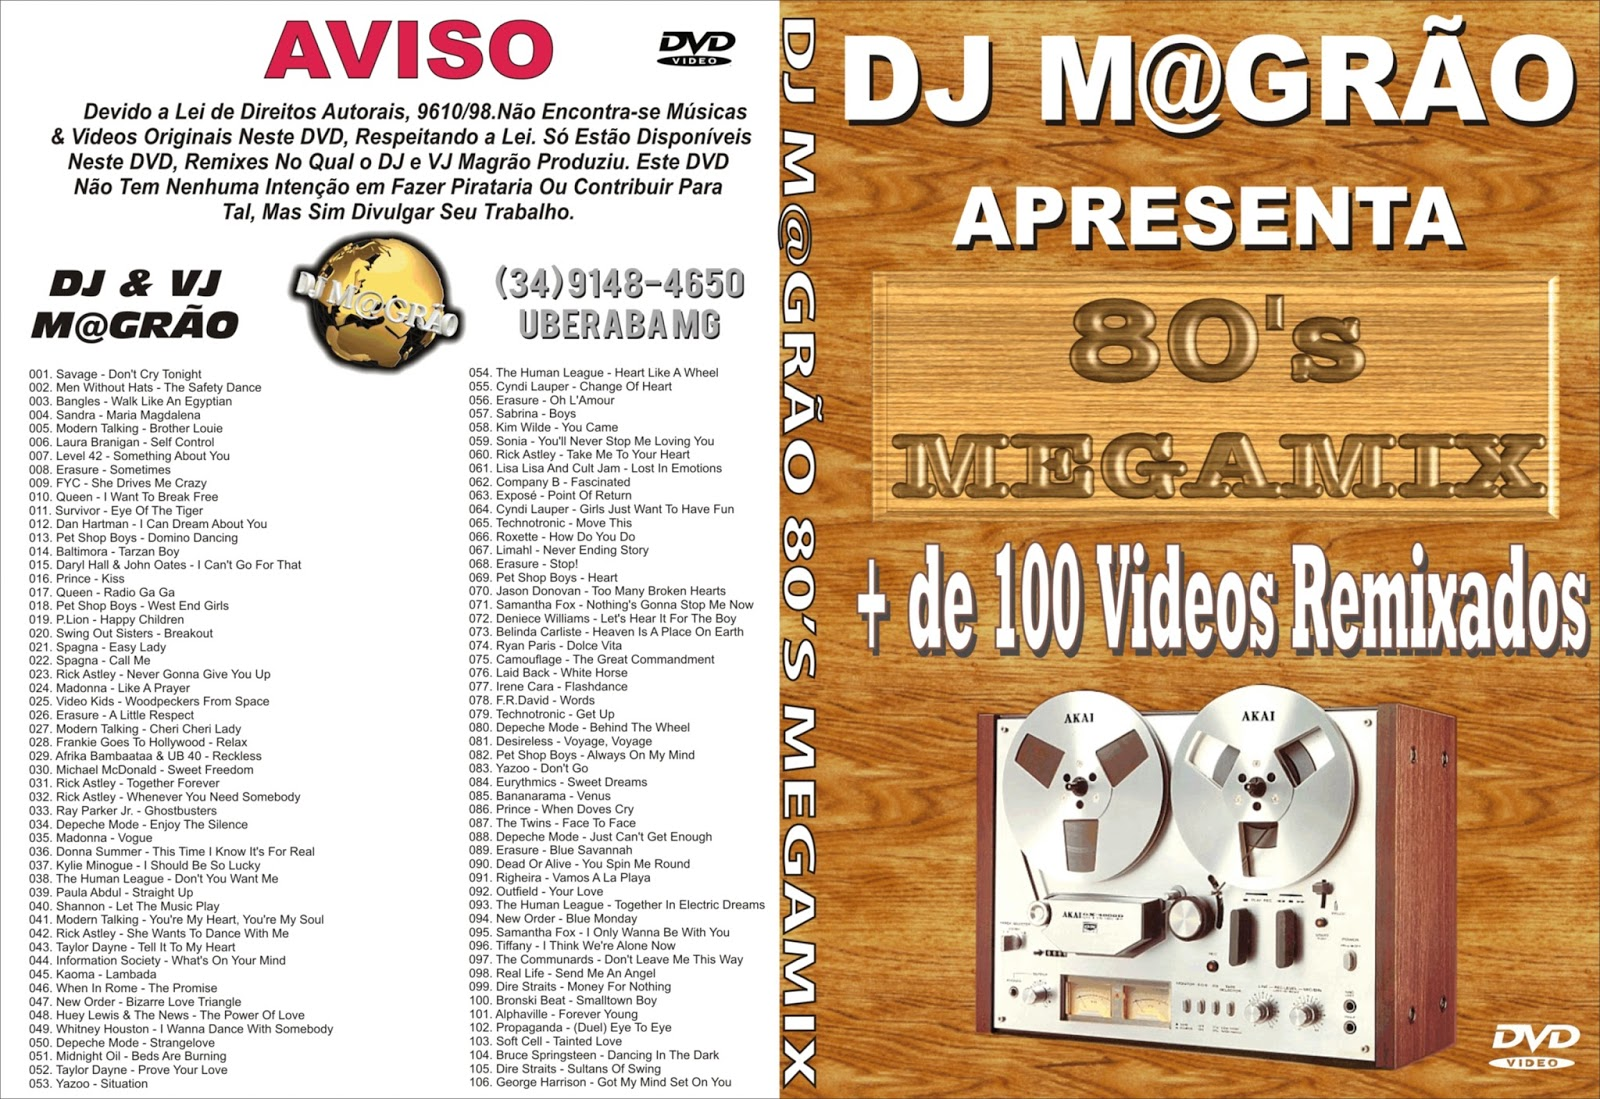 DVD ERASURE BAIXAR